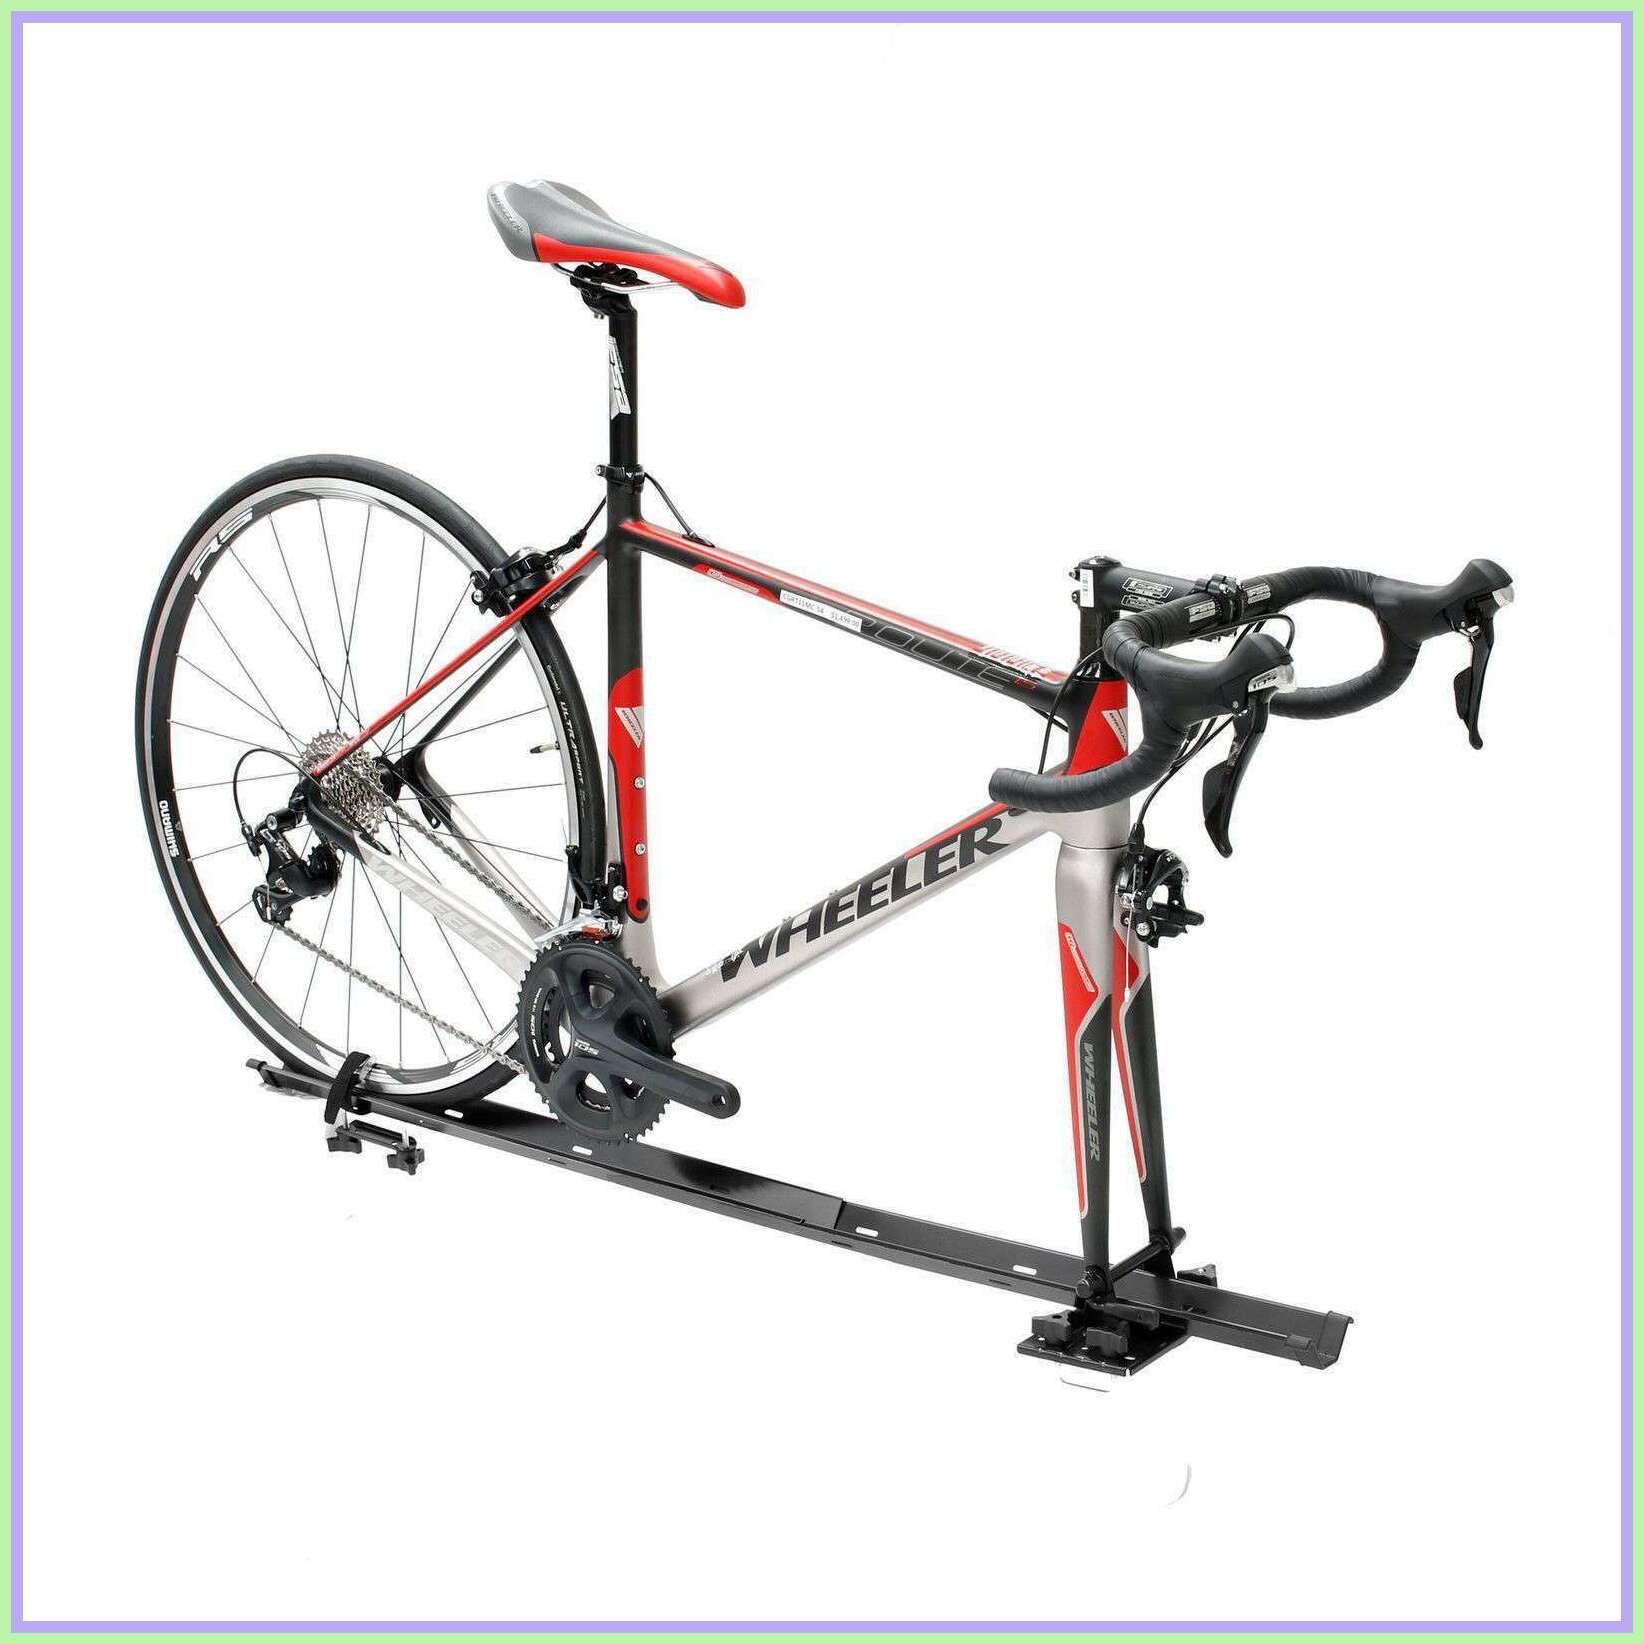 80 Reference Of Bike Rack Roof Bars In 2020 Bike Roof Rack Roof Mount Bike Rack Best Bike Rack